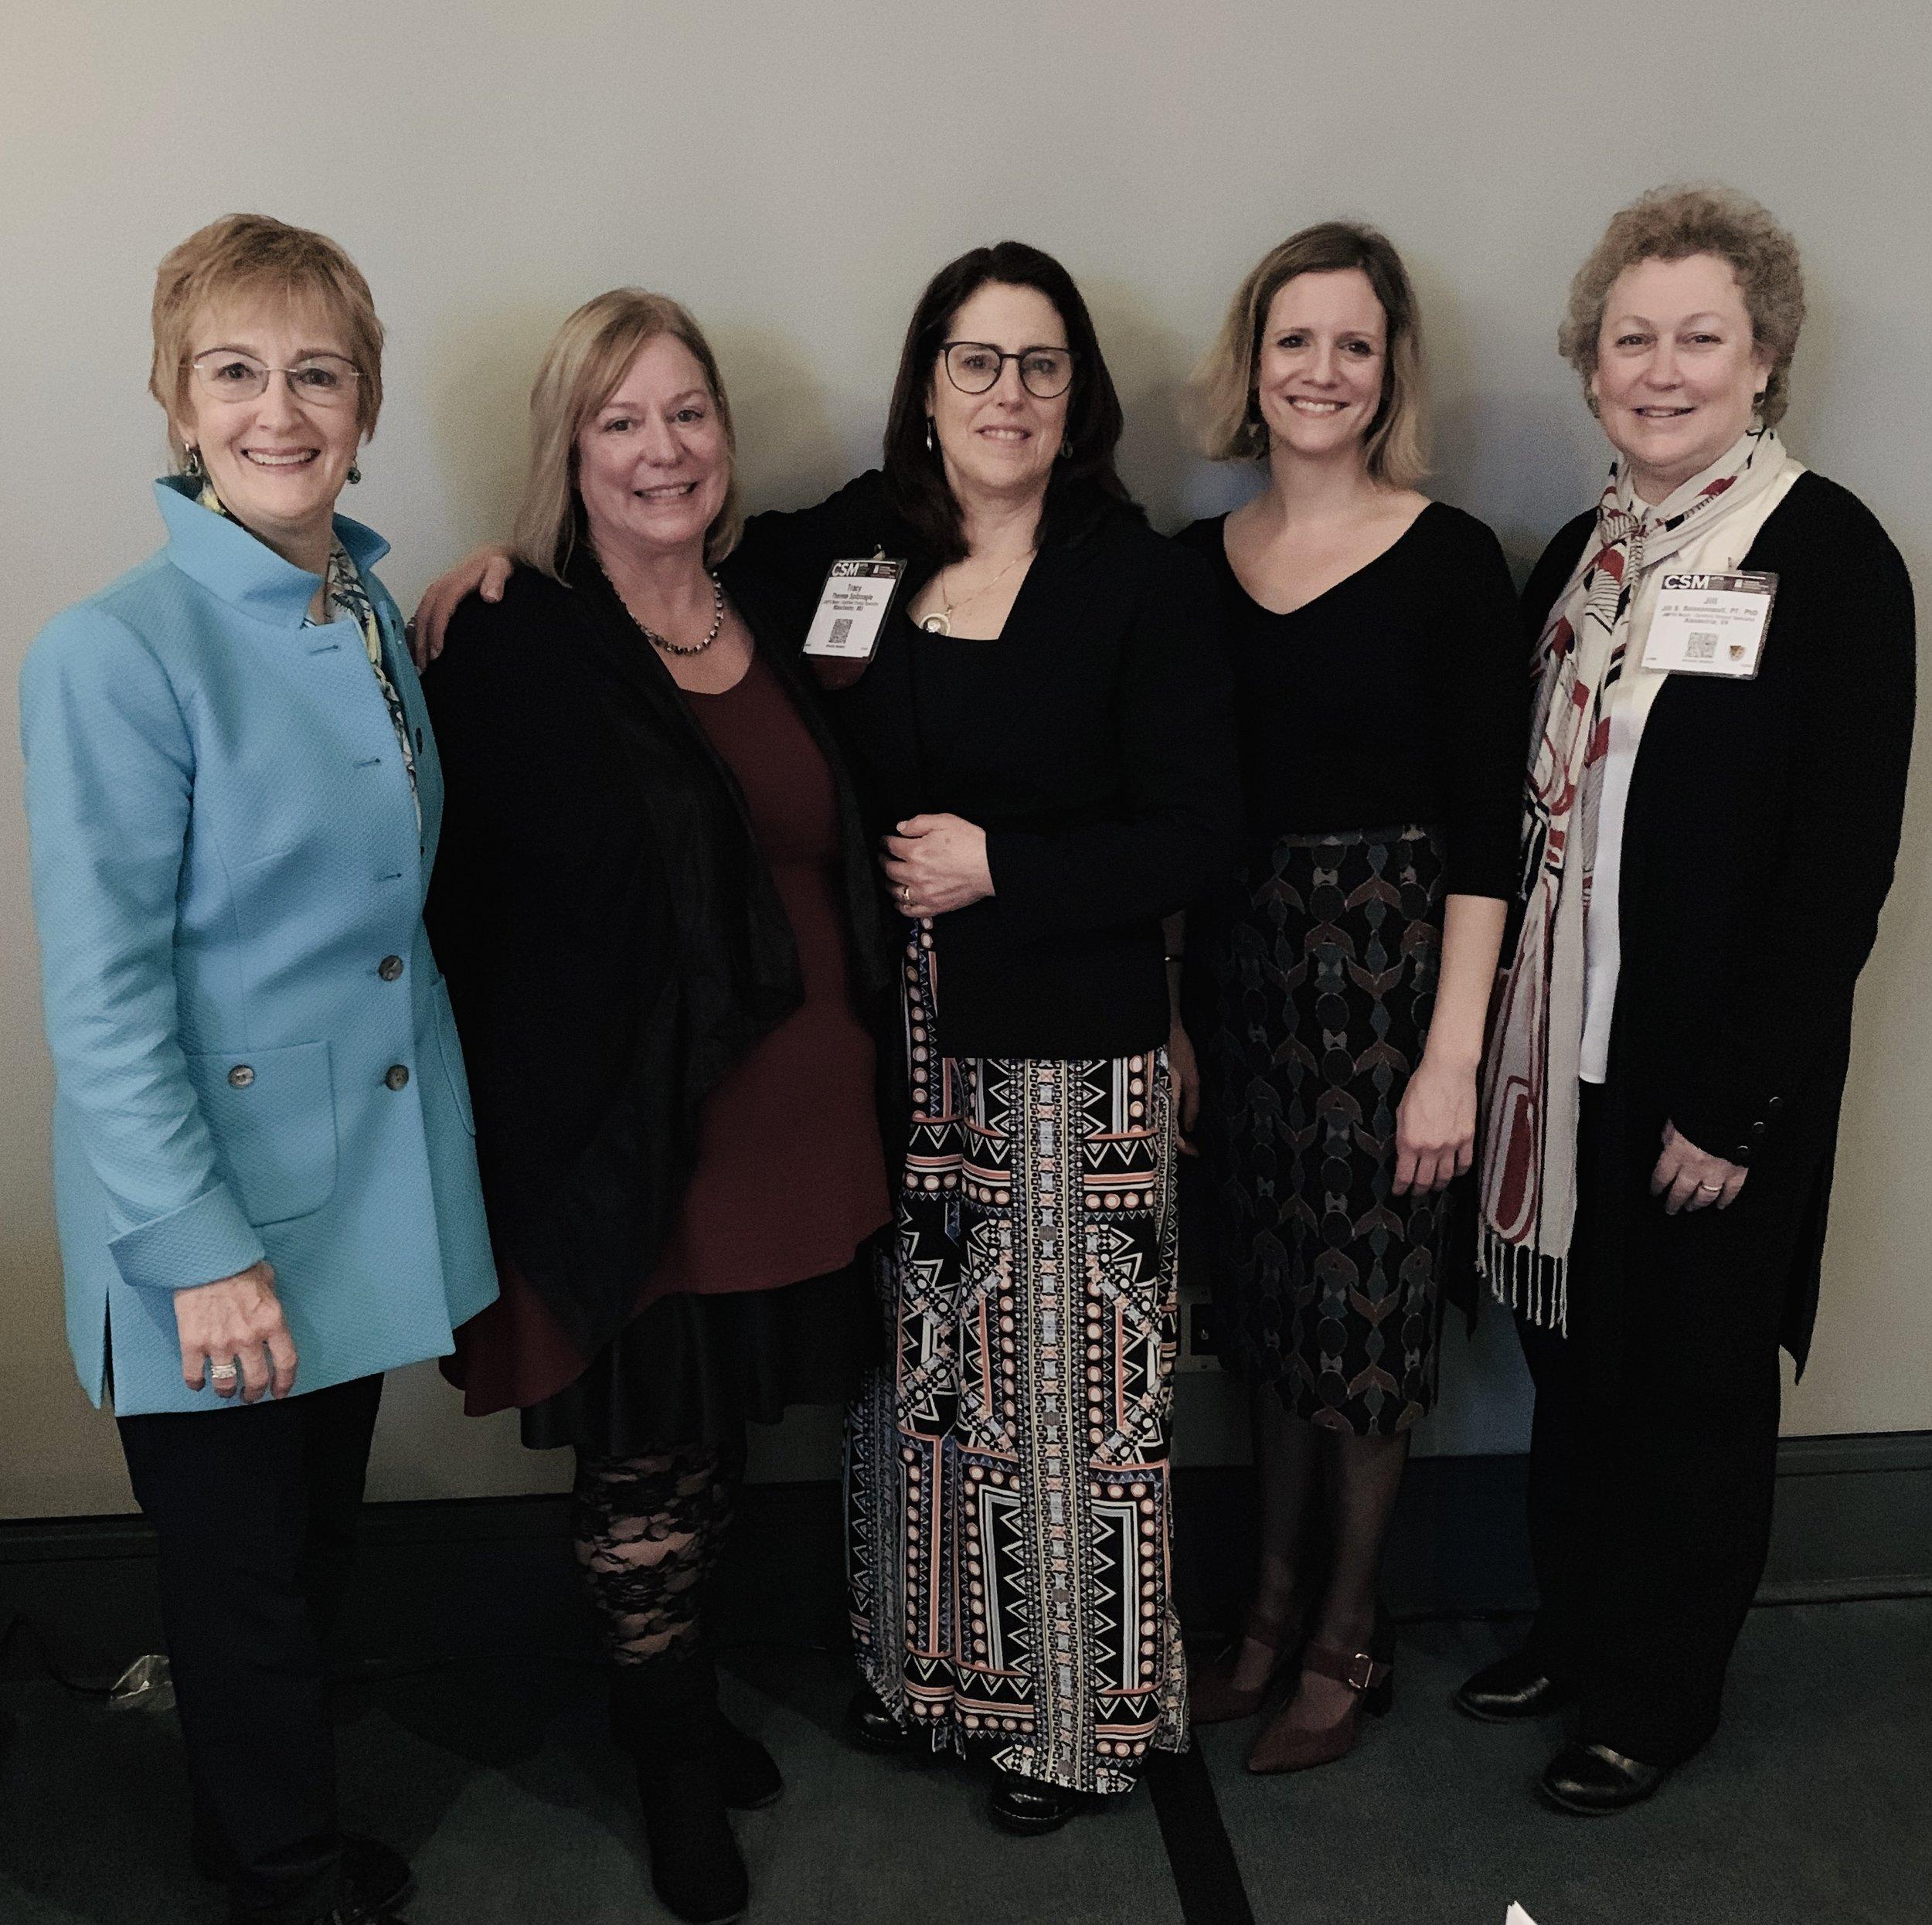 Rebecca Stephenson, Susan Clinton, Tracy Spitznagle, Laura Kaiser, Jill Boissonnault